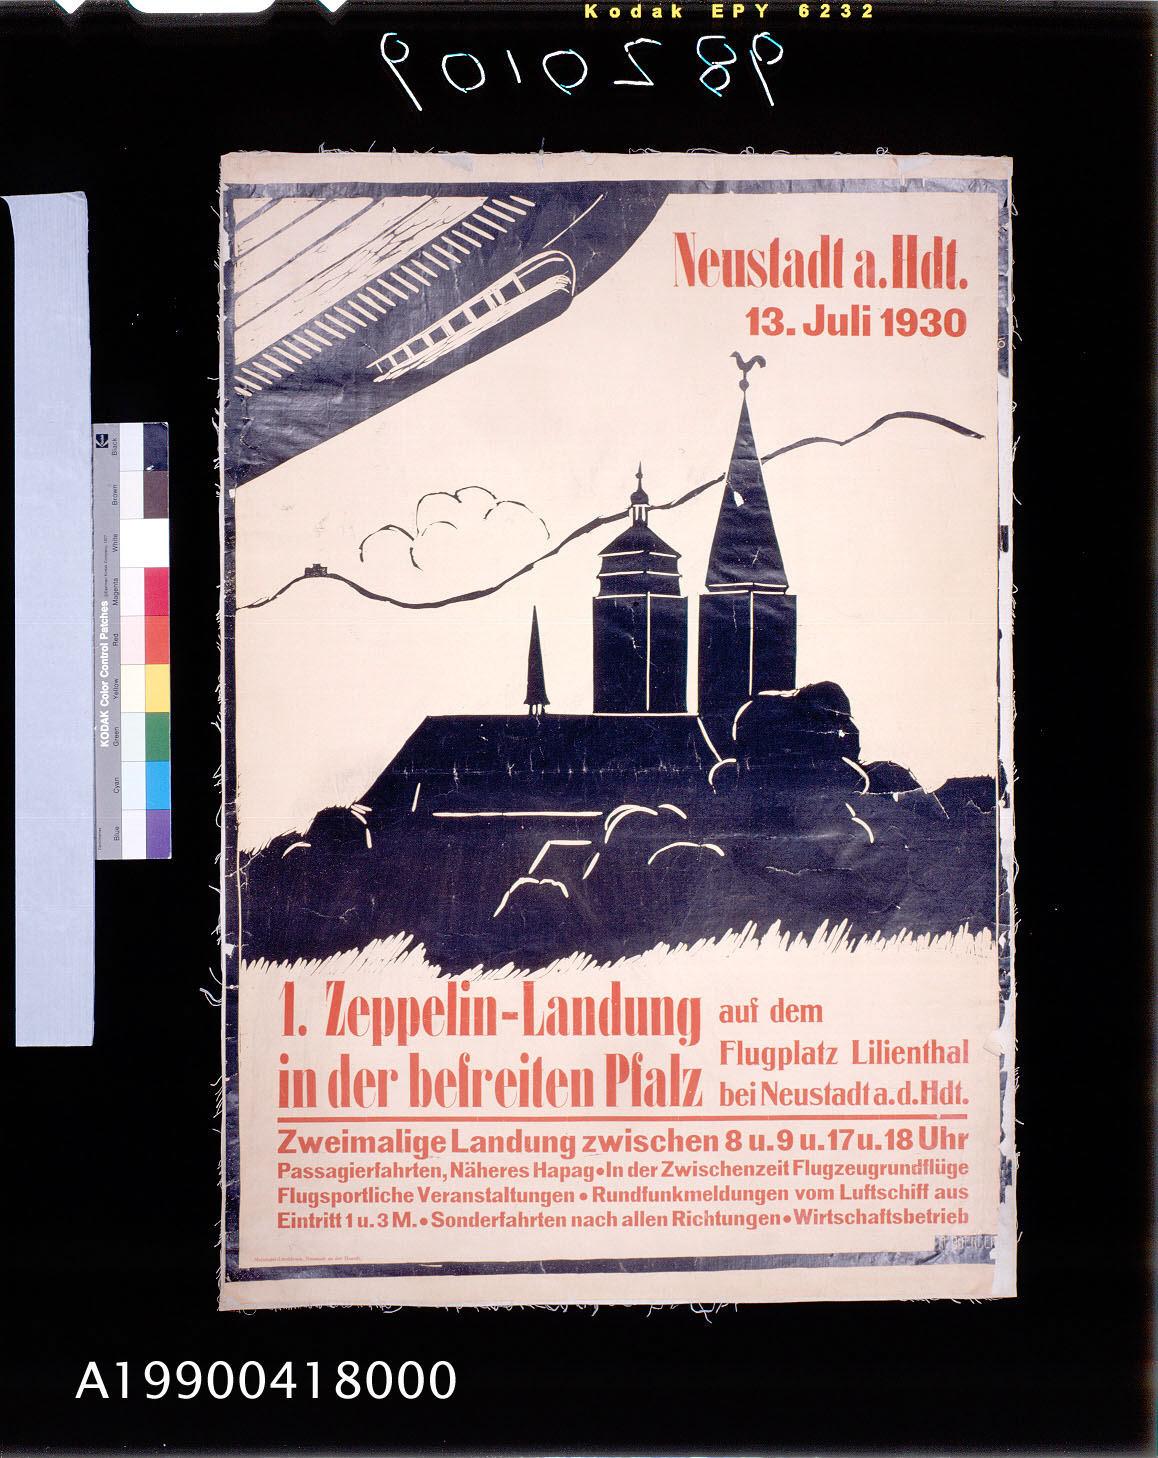 Image of : Zeppelin-Landung in der befreiten Pfalz